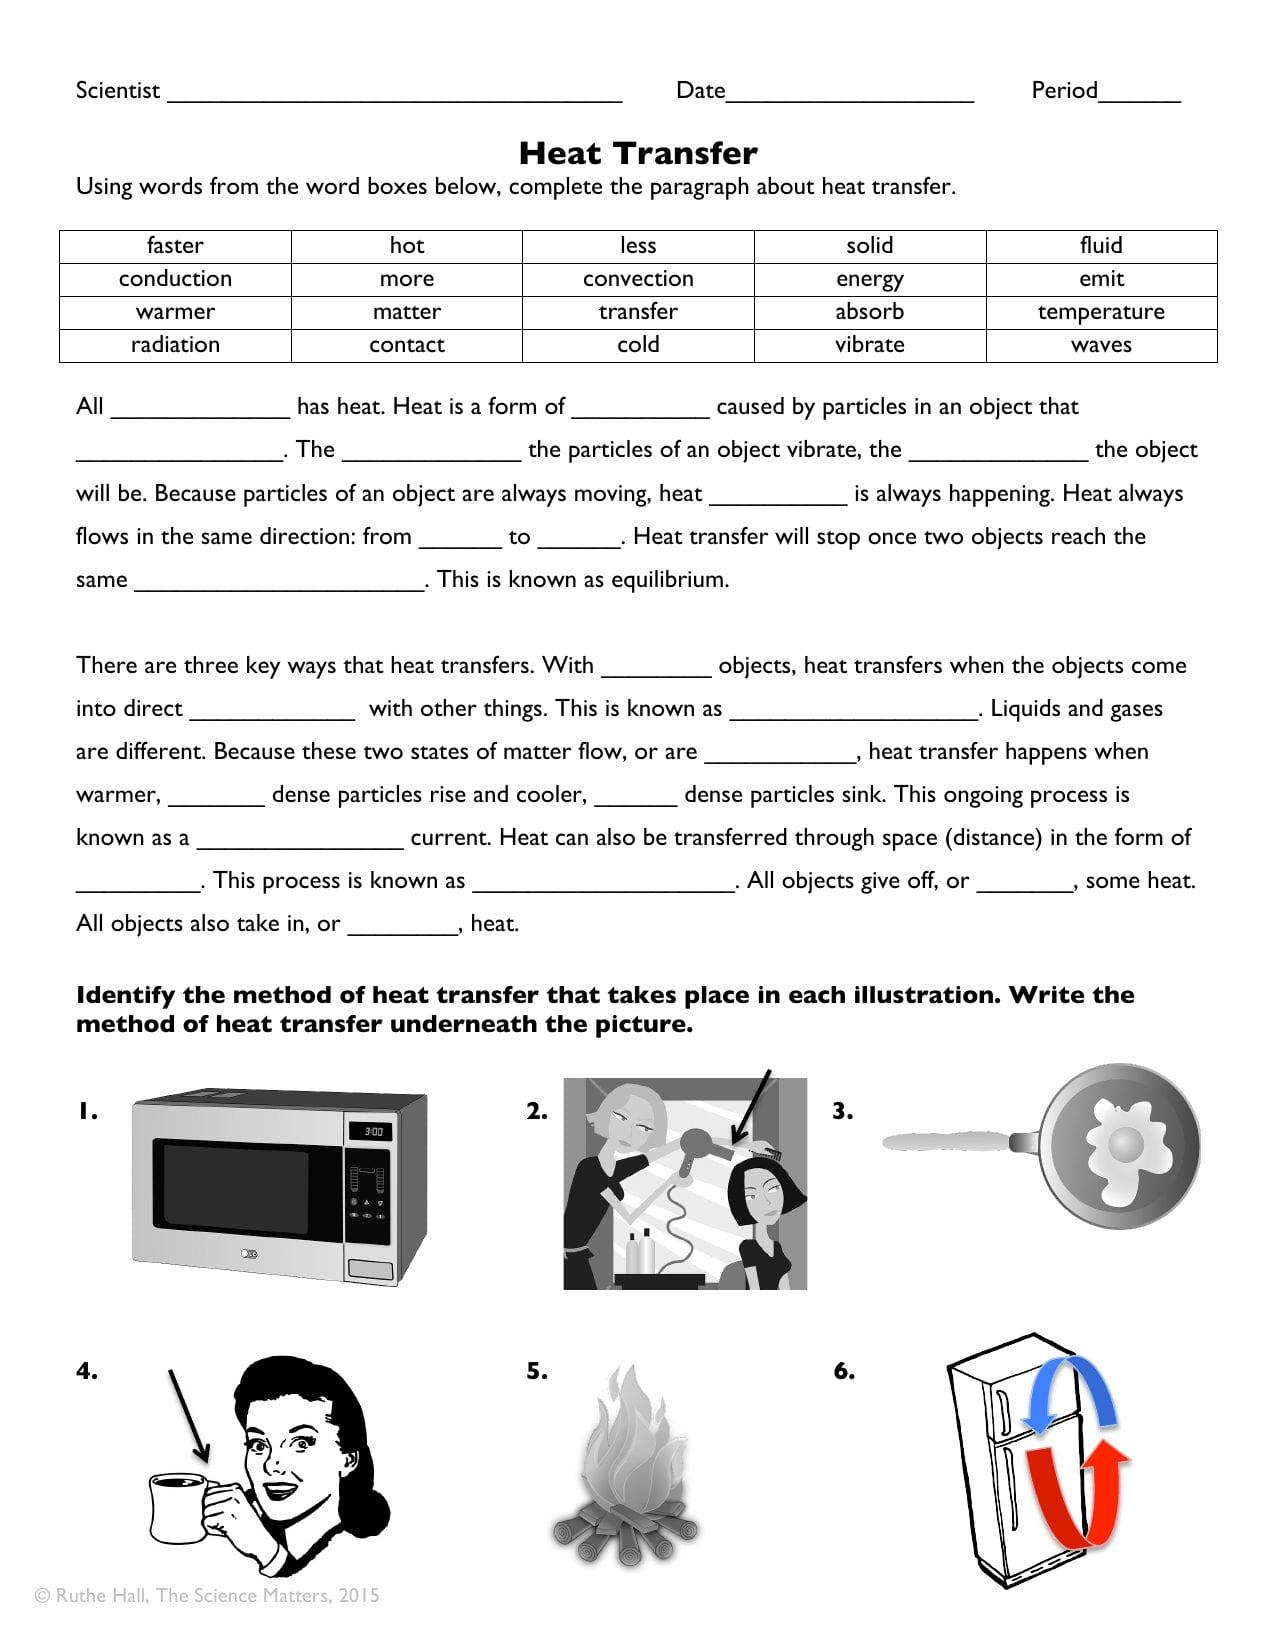 Heat Transfer Worksheet Answers